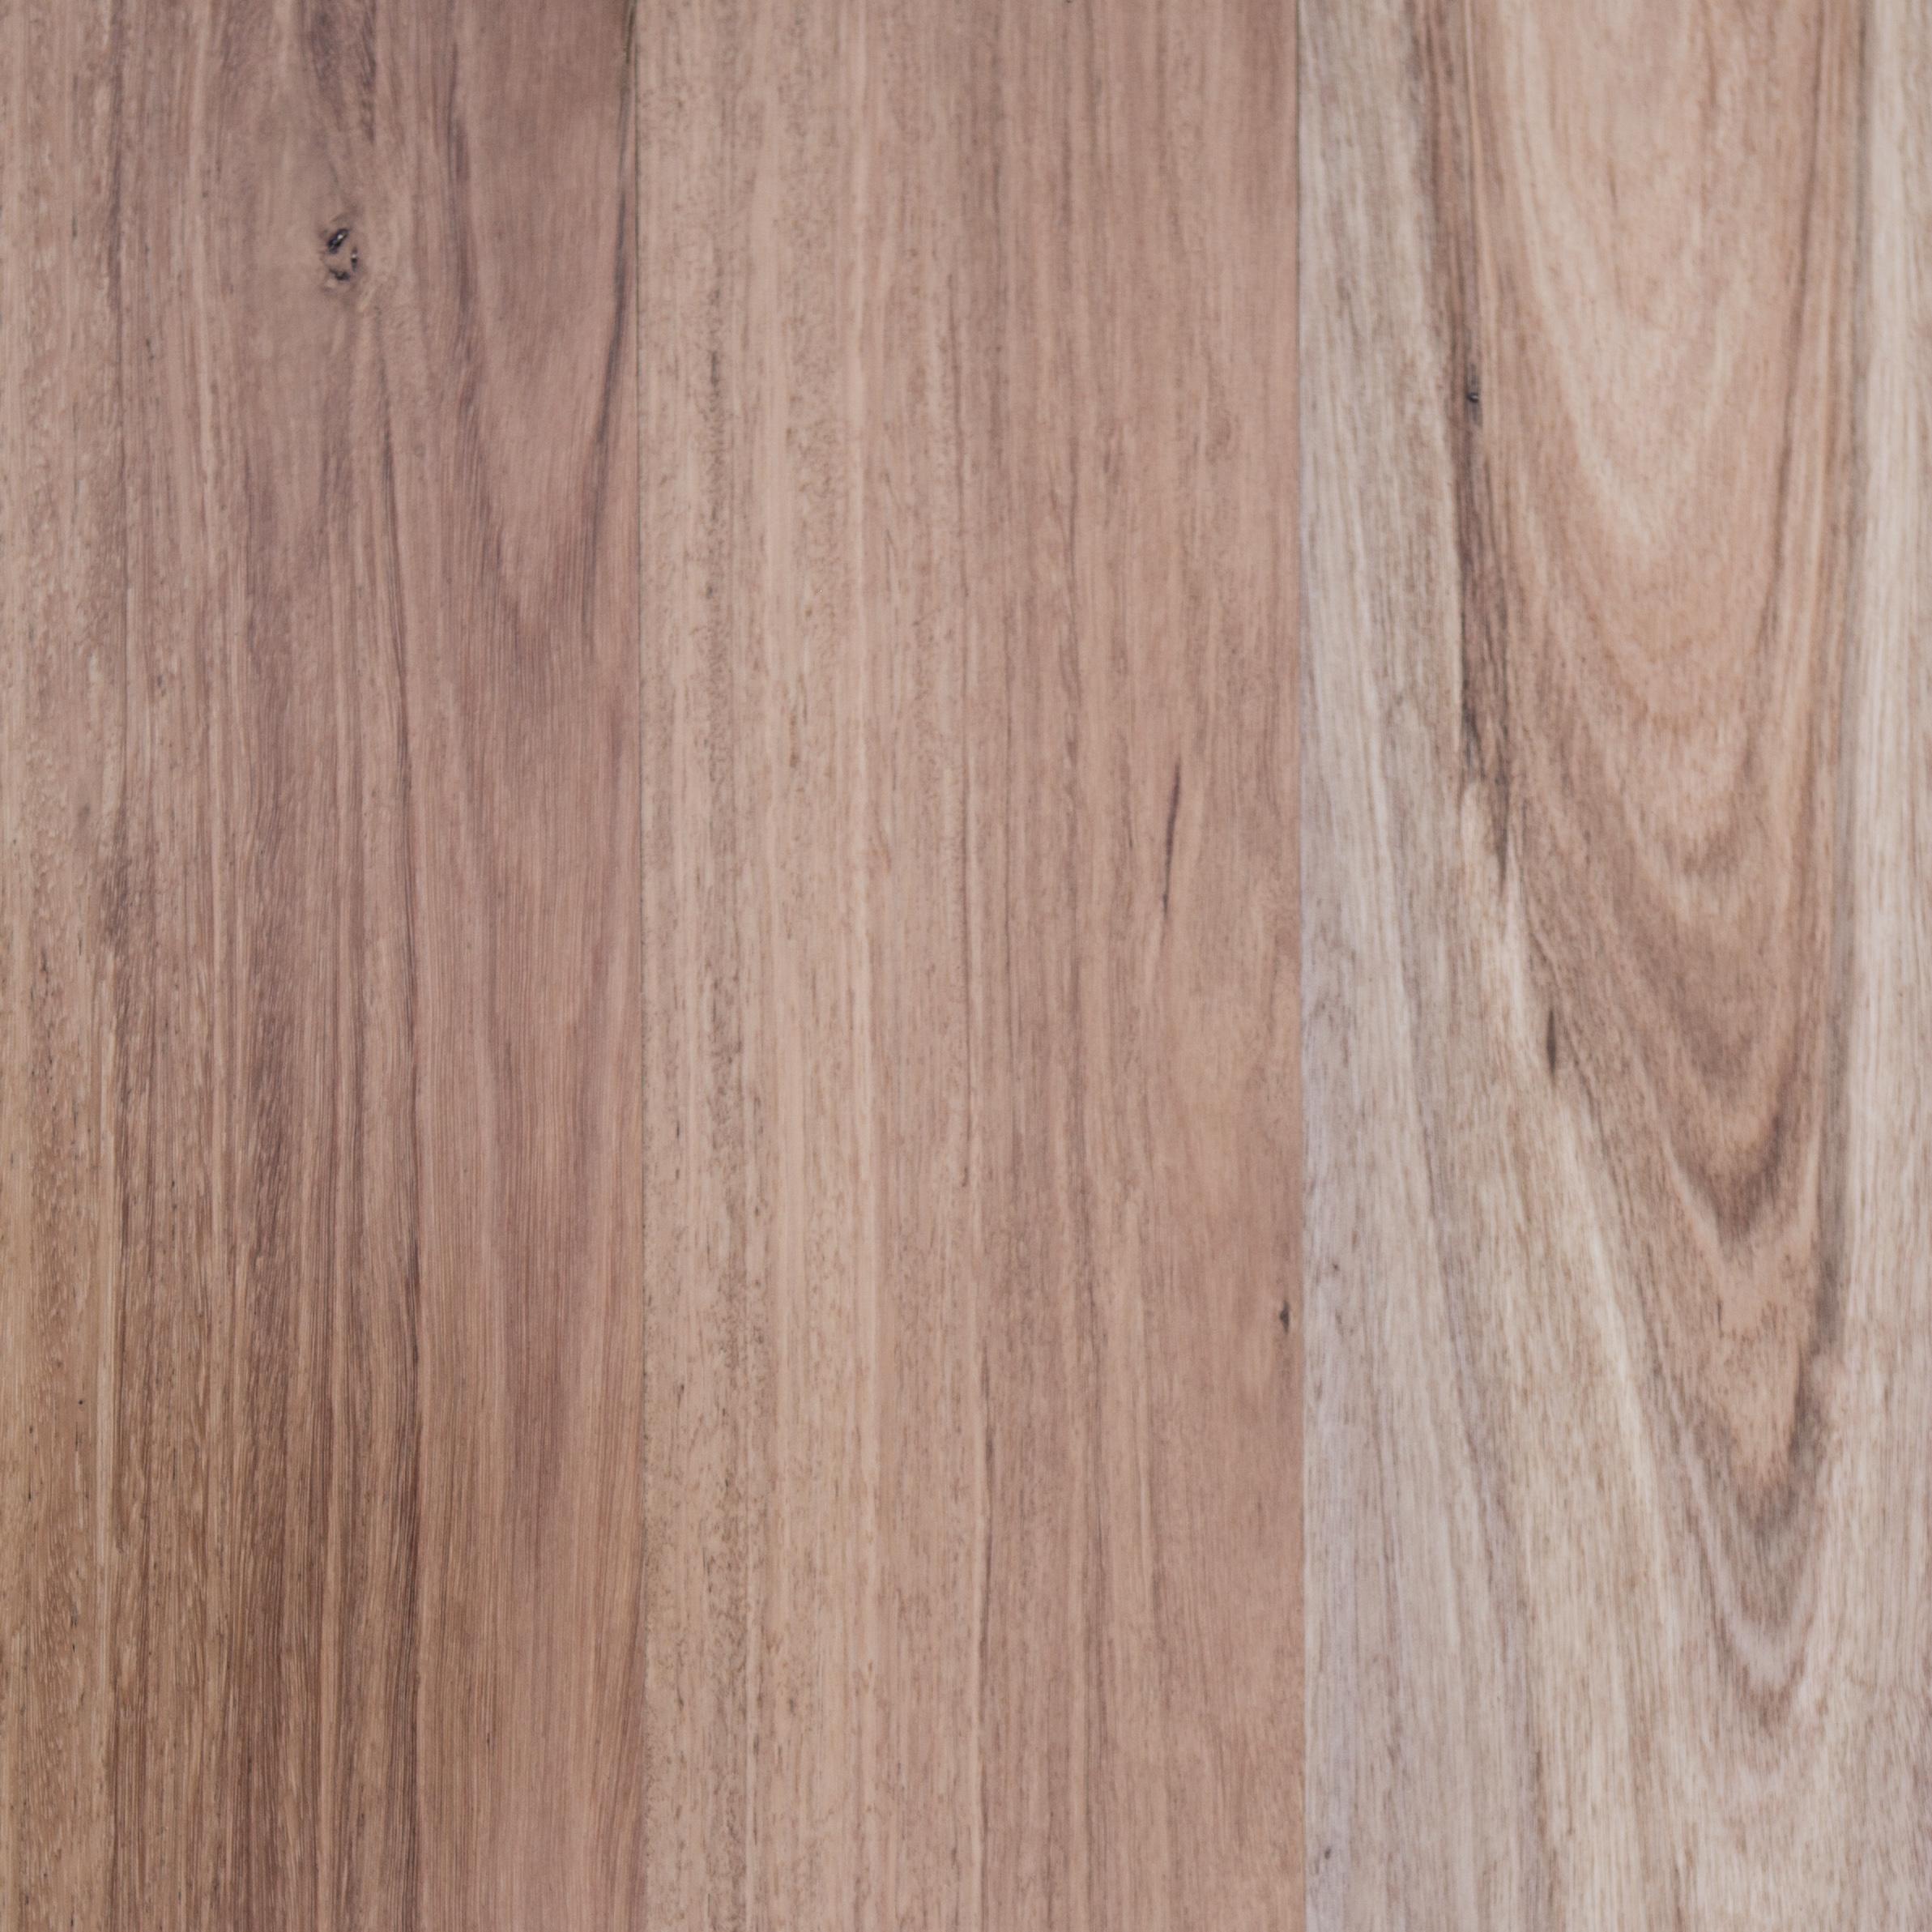 Signature Australian Blackbutt Trevors Carpets